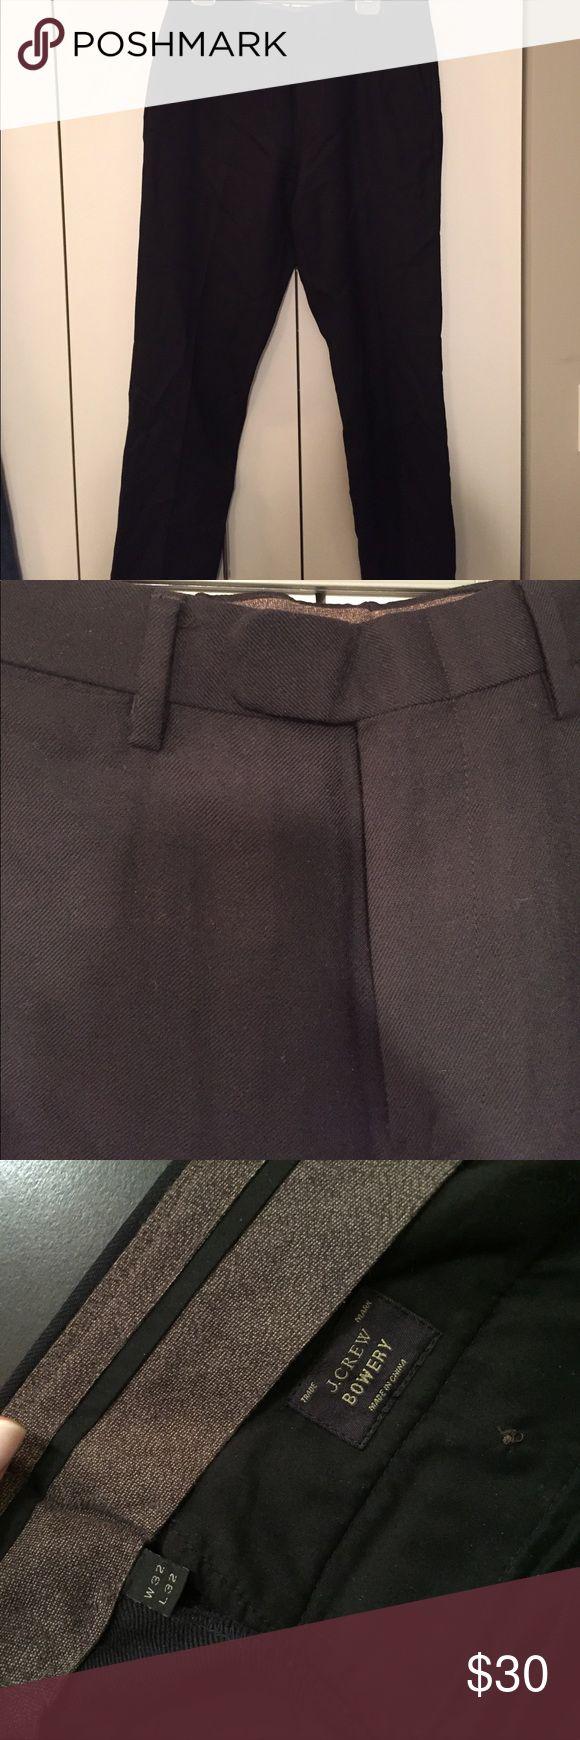 J. Crew Bowery Slim Fit Navy Dress Pants Bowery style slim fit J. Crew dress pants. Navy, great condition. 32,32. J. Crew Pants Dress